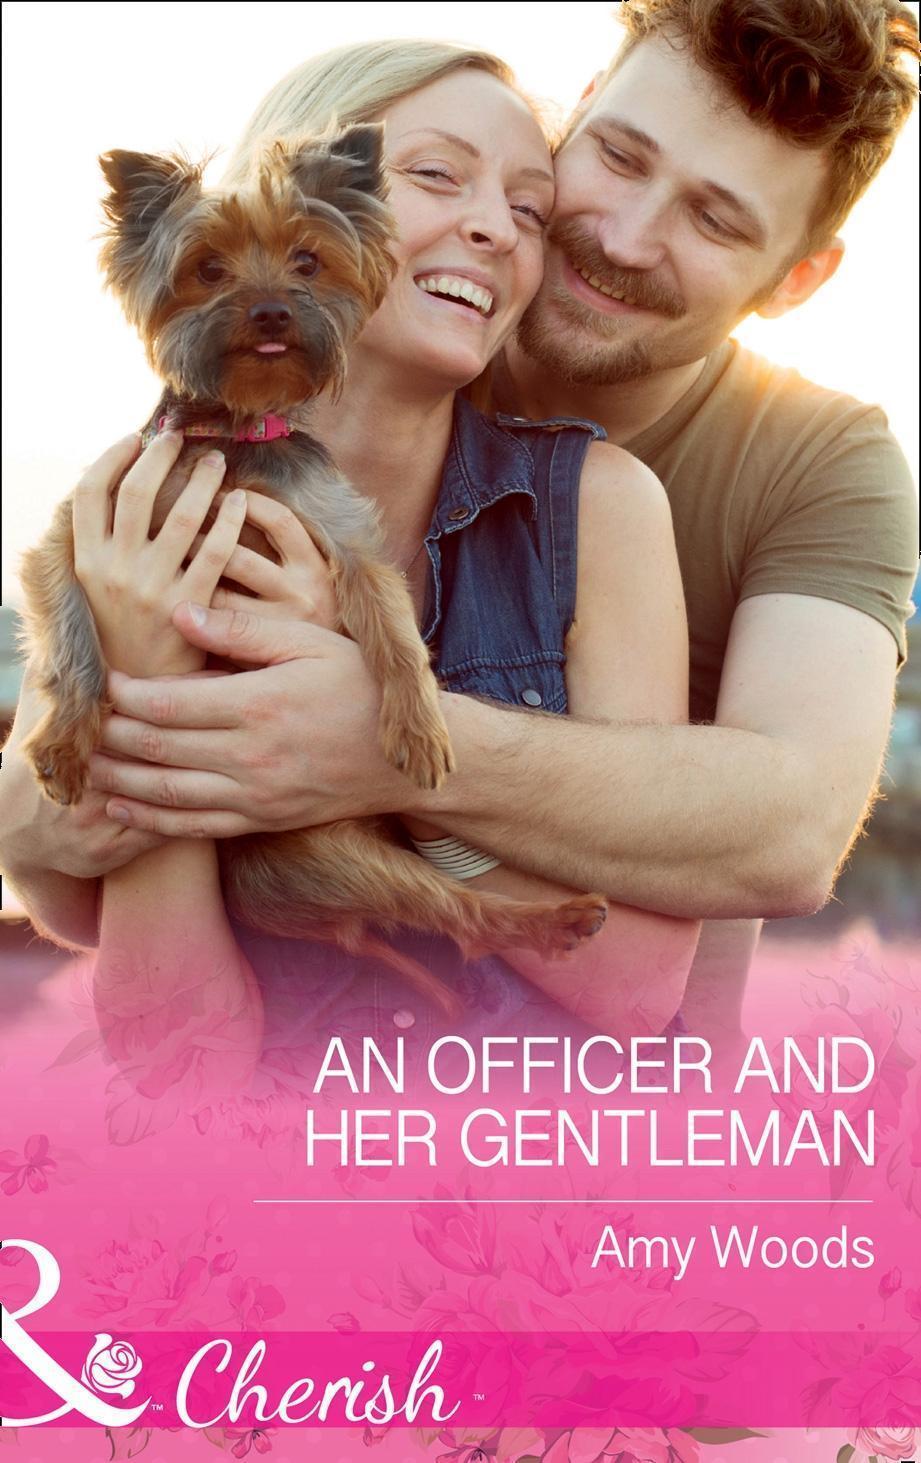 An Officer And Her Gentleman (Mills & Boon Cherish) (Peach Leaf, Texas, Book 2)